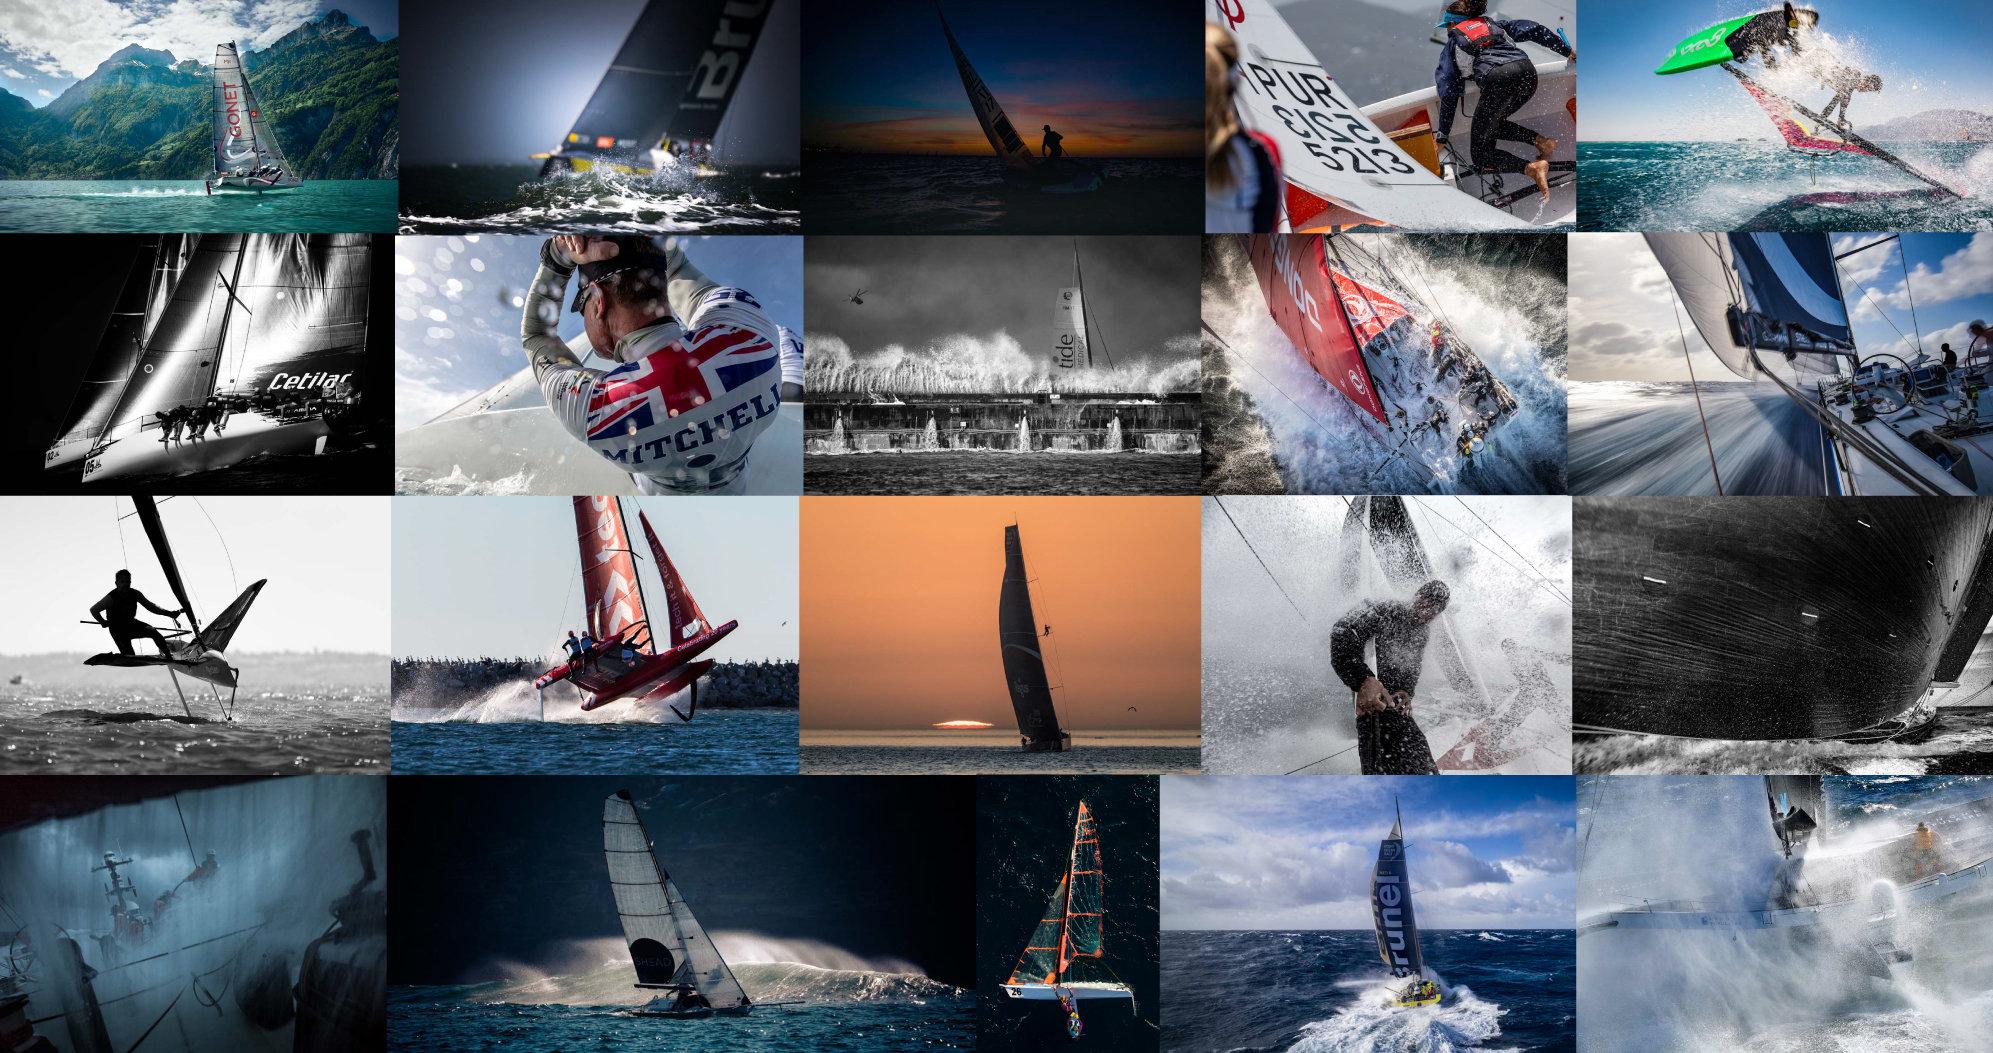 Mirabaud Yacht Racing Image finalists 2018